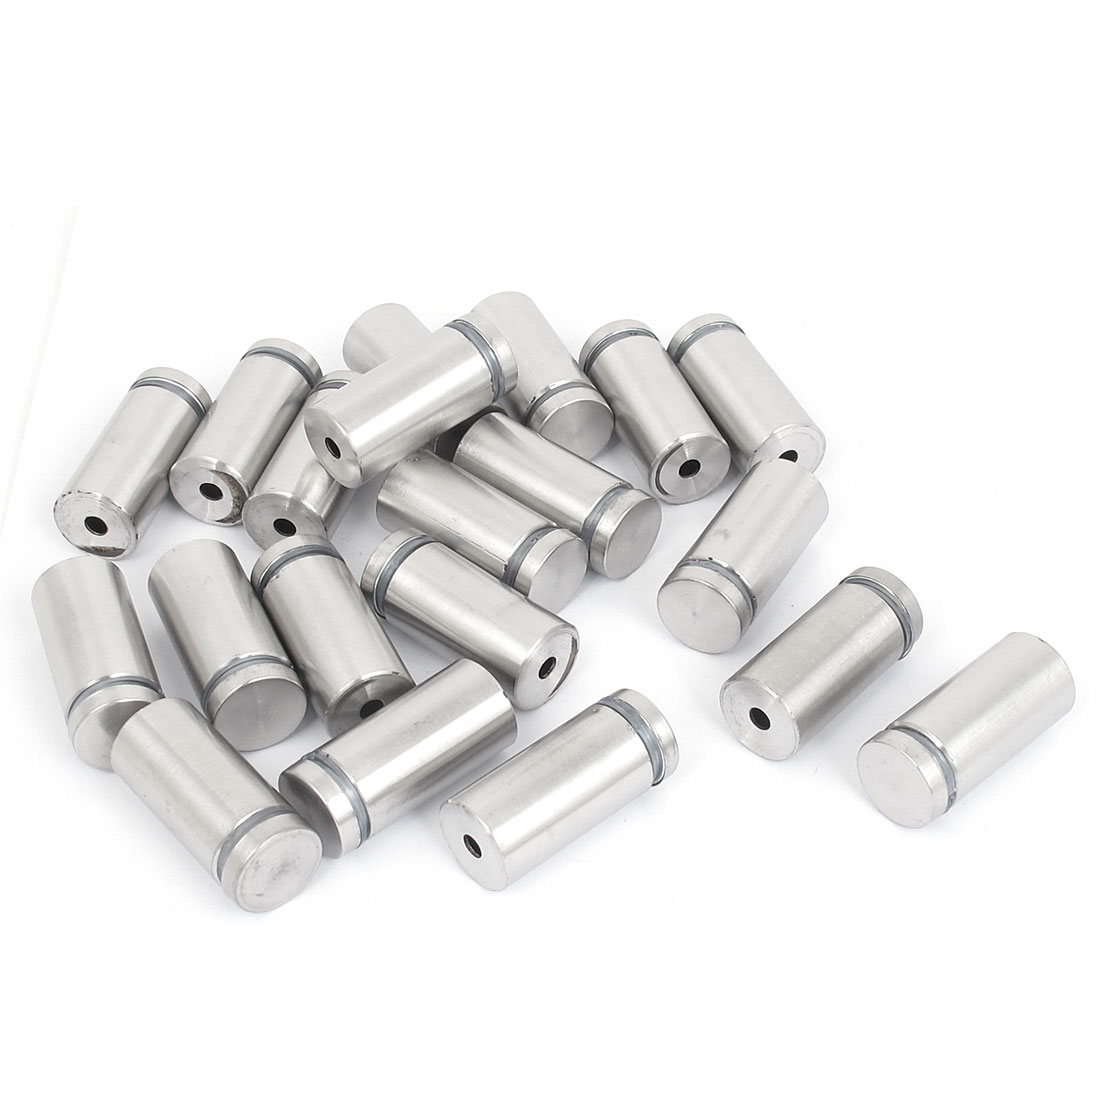 19mm x 40mm Stainless Steel Advertising Frameless Glass Standoff Pins 20pcs